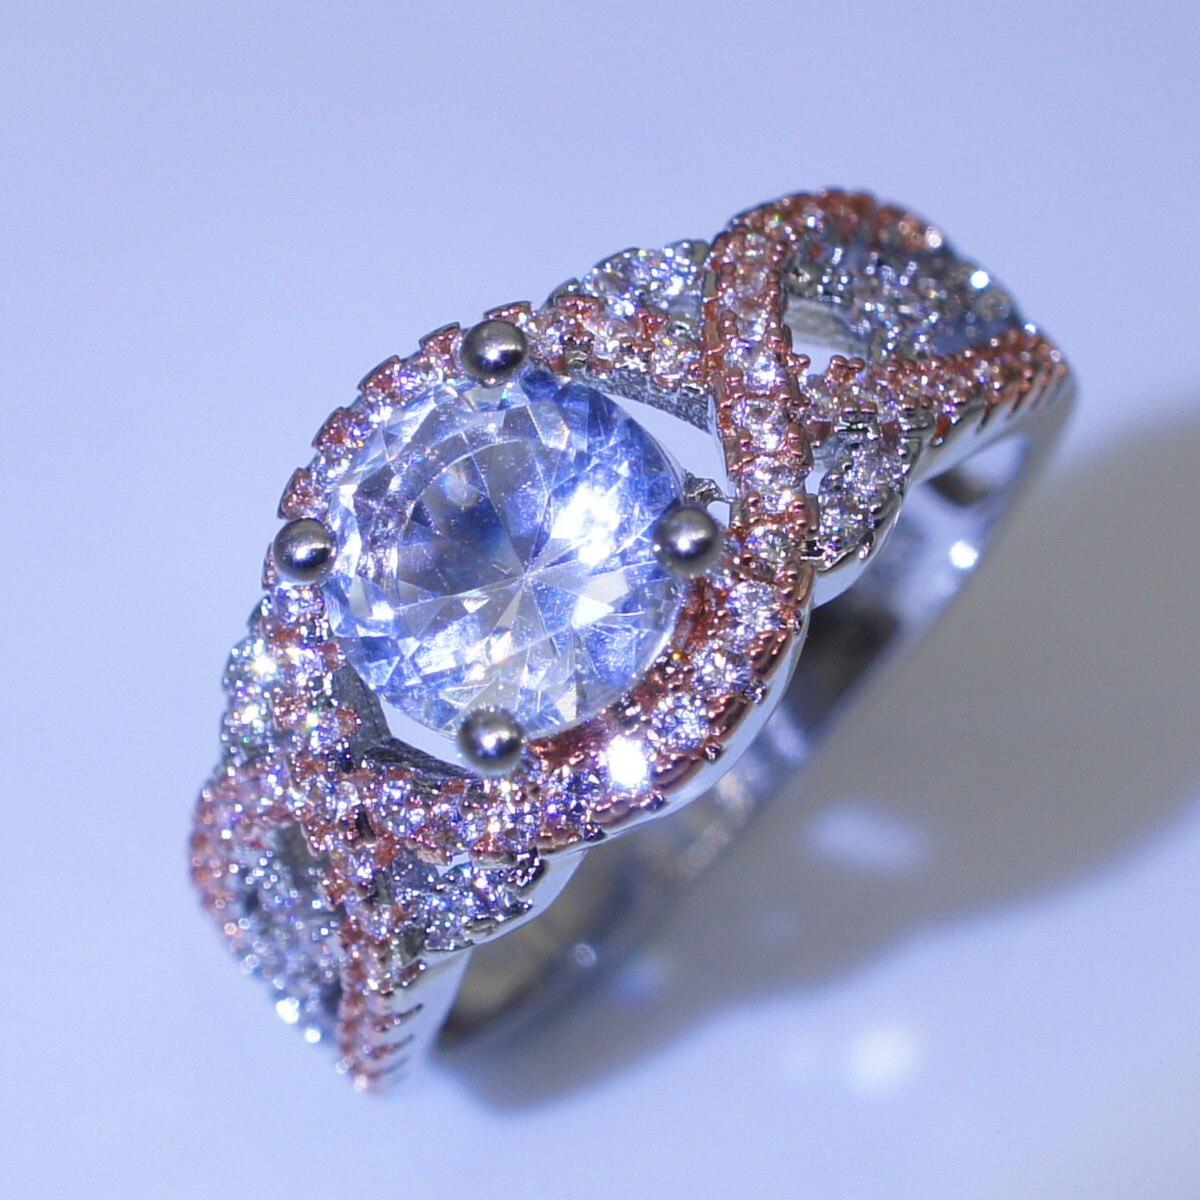 14 Rose-gold Split Ringe Simulierten Diamant Verlobung Ringe für Frauen schmuck Bizuteria Diamante Edelstein Anillos De mystic Ring